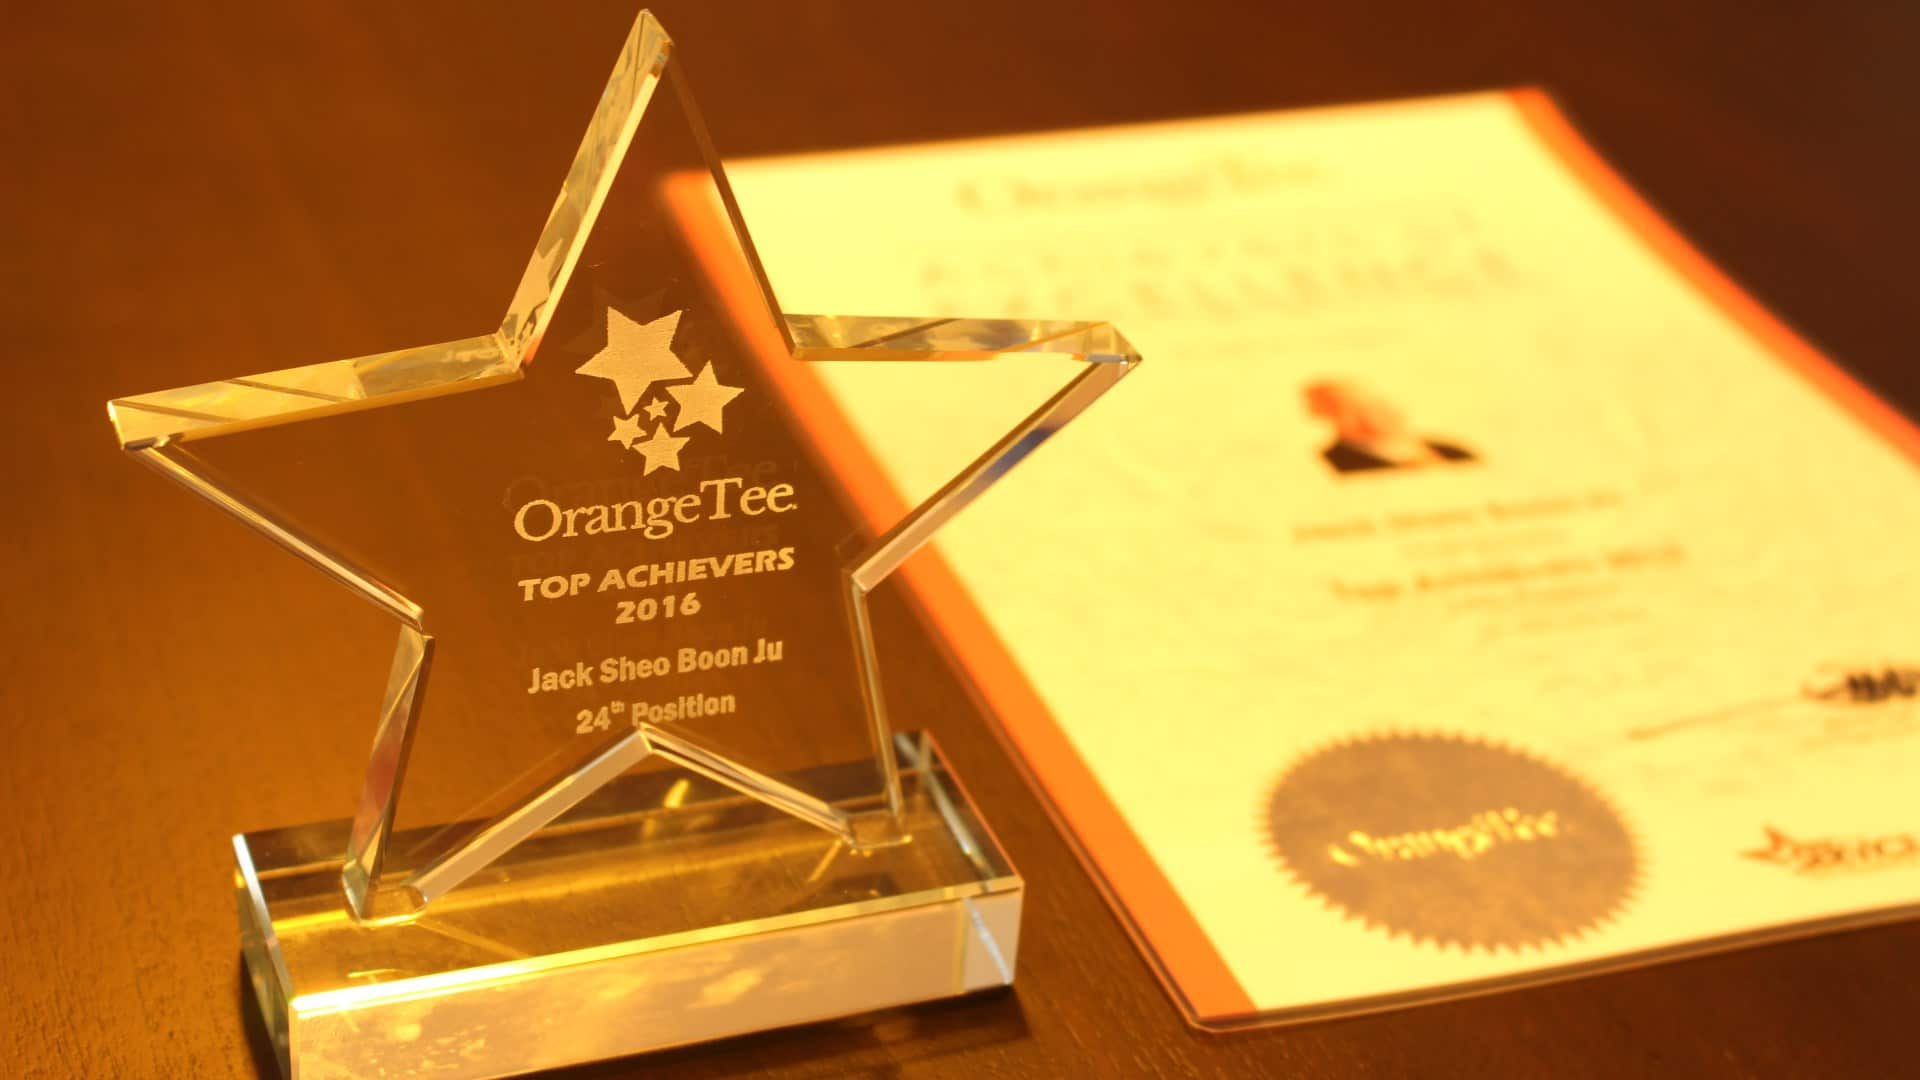 OrangeTee TOP Achiever 2016